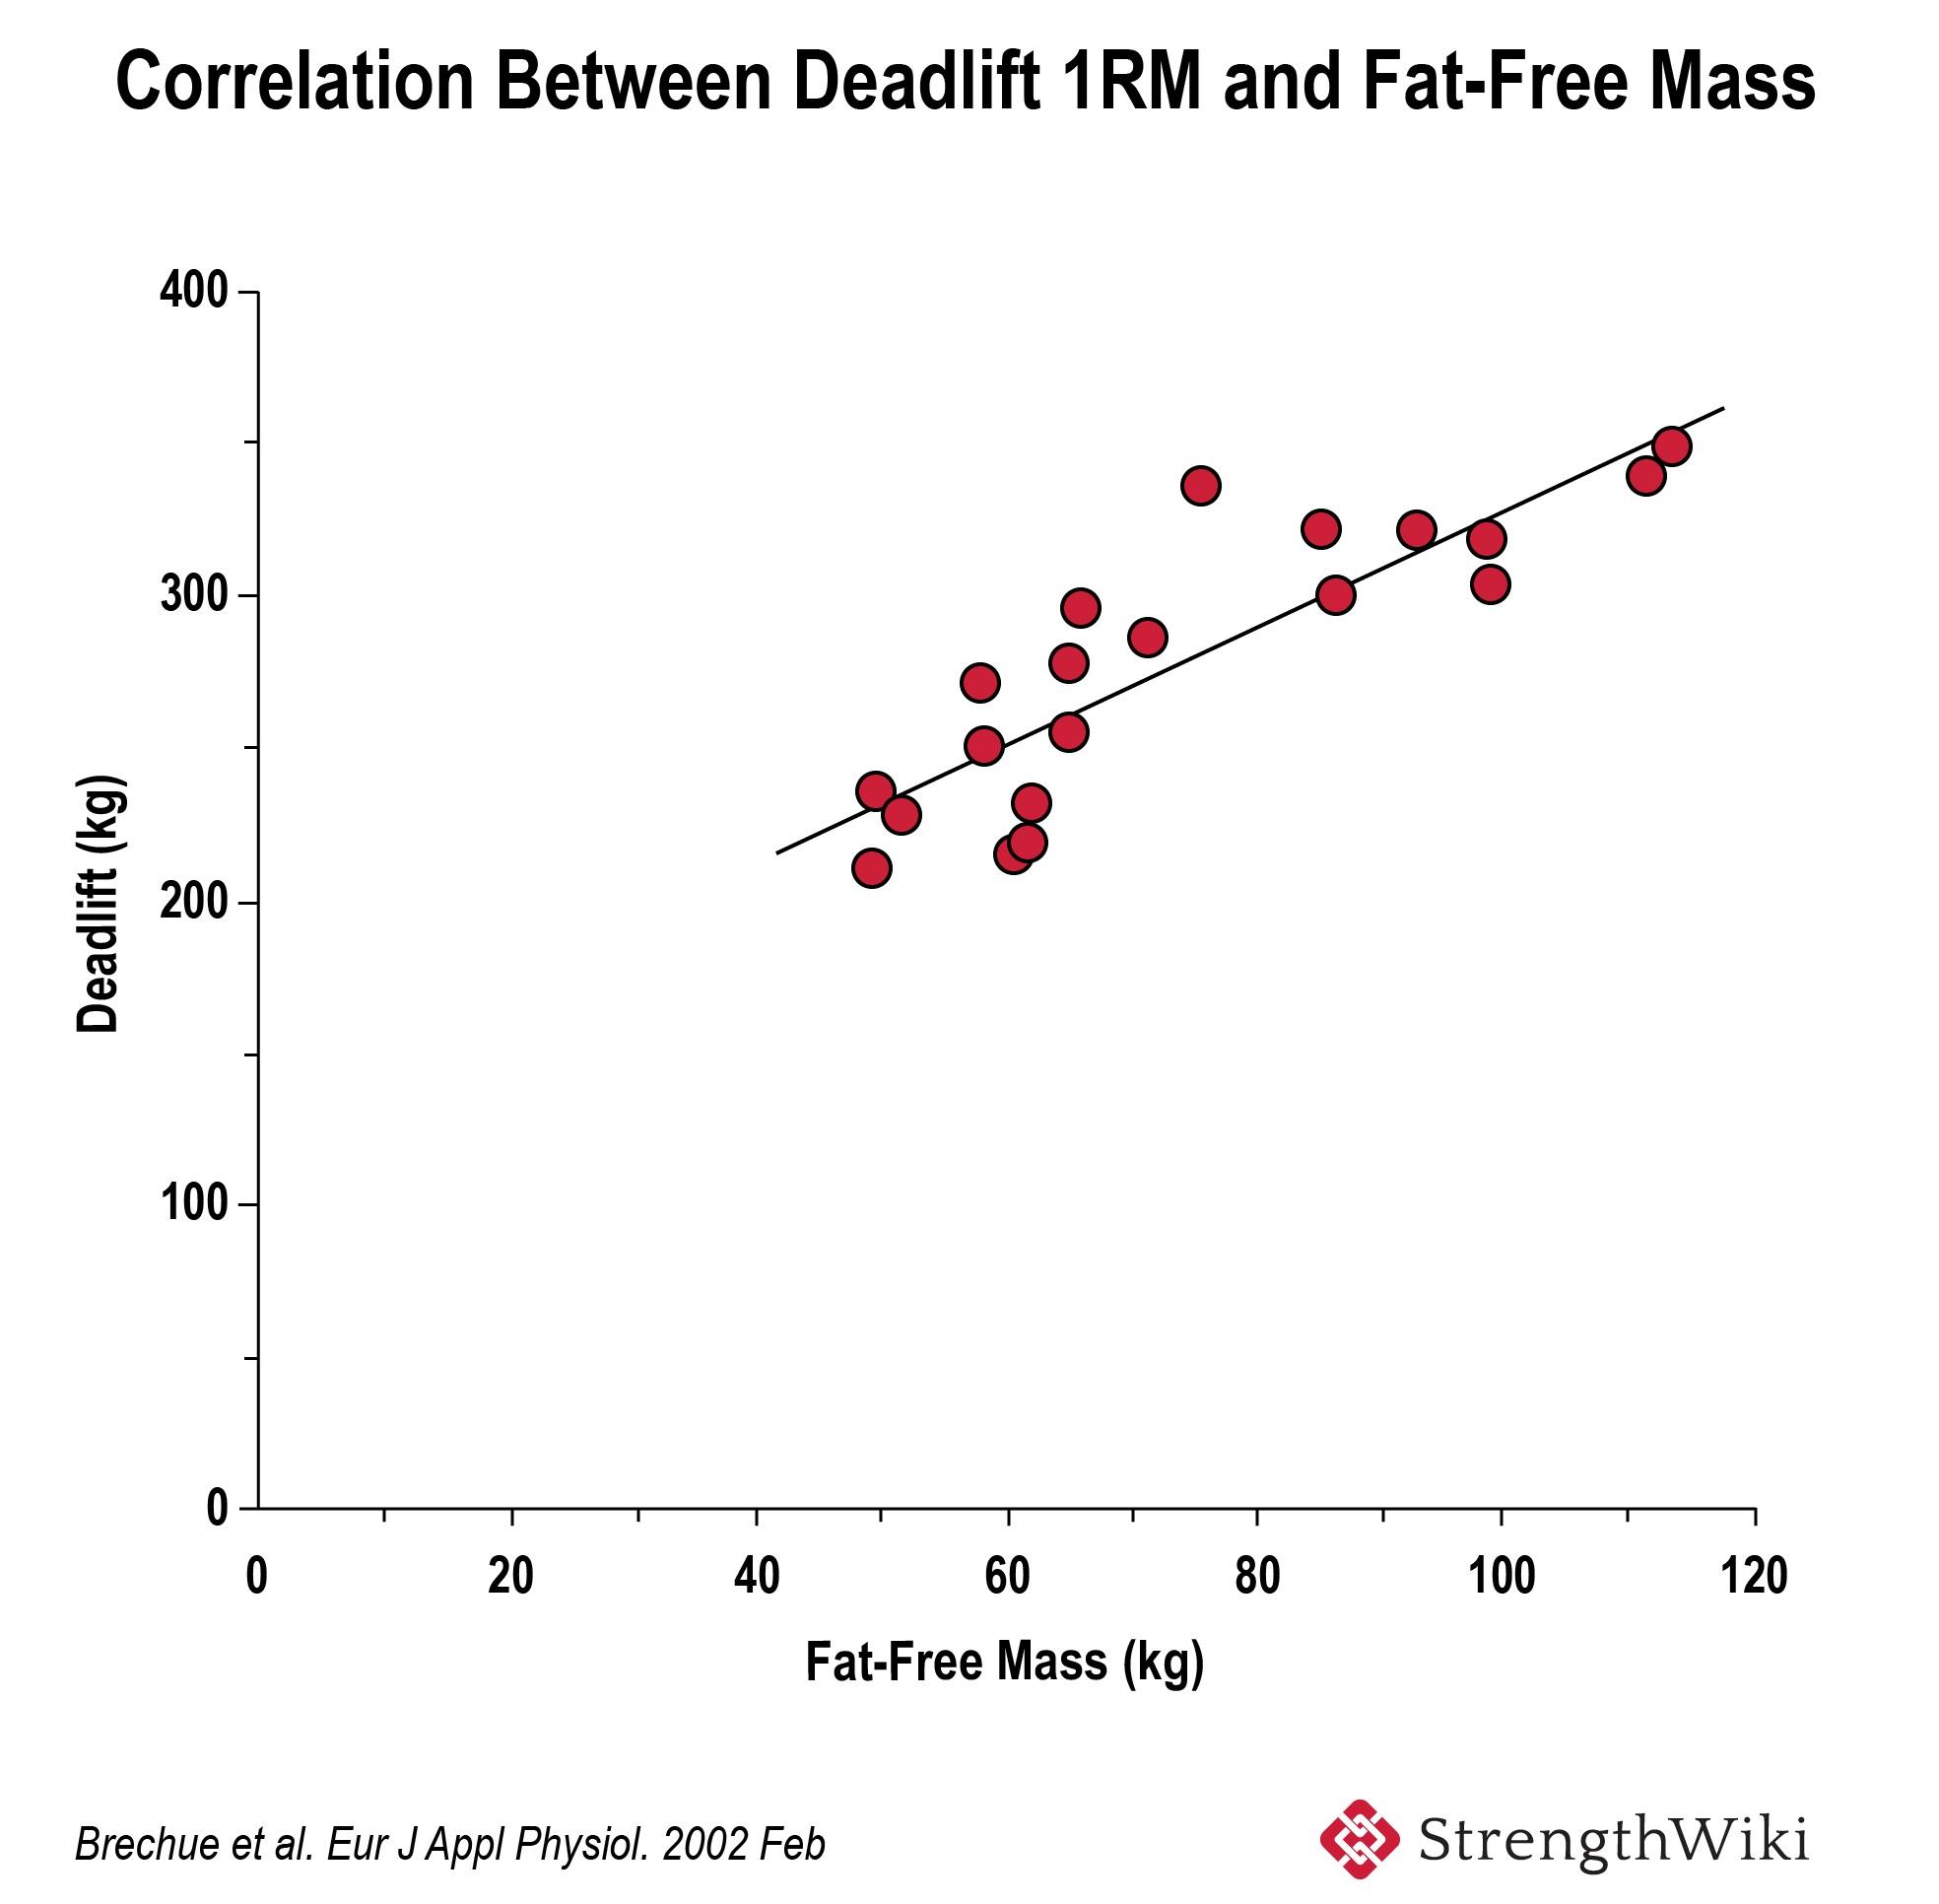 Correlation between deadlift 1RM and fat free mass.